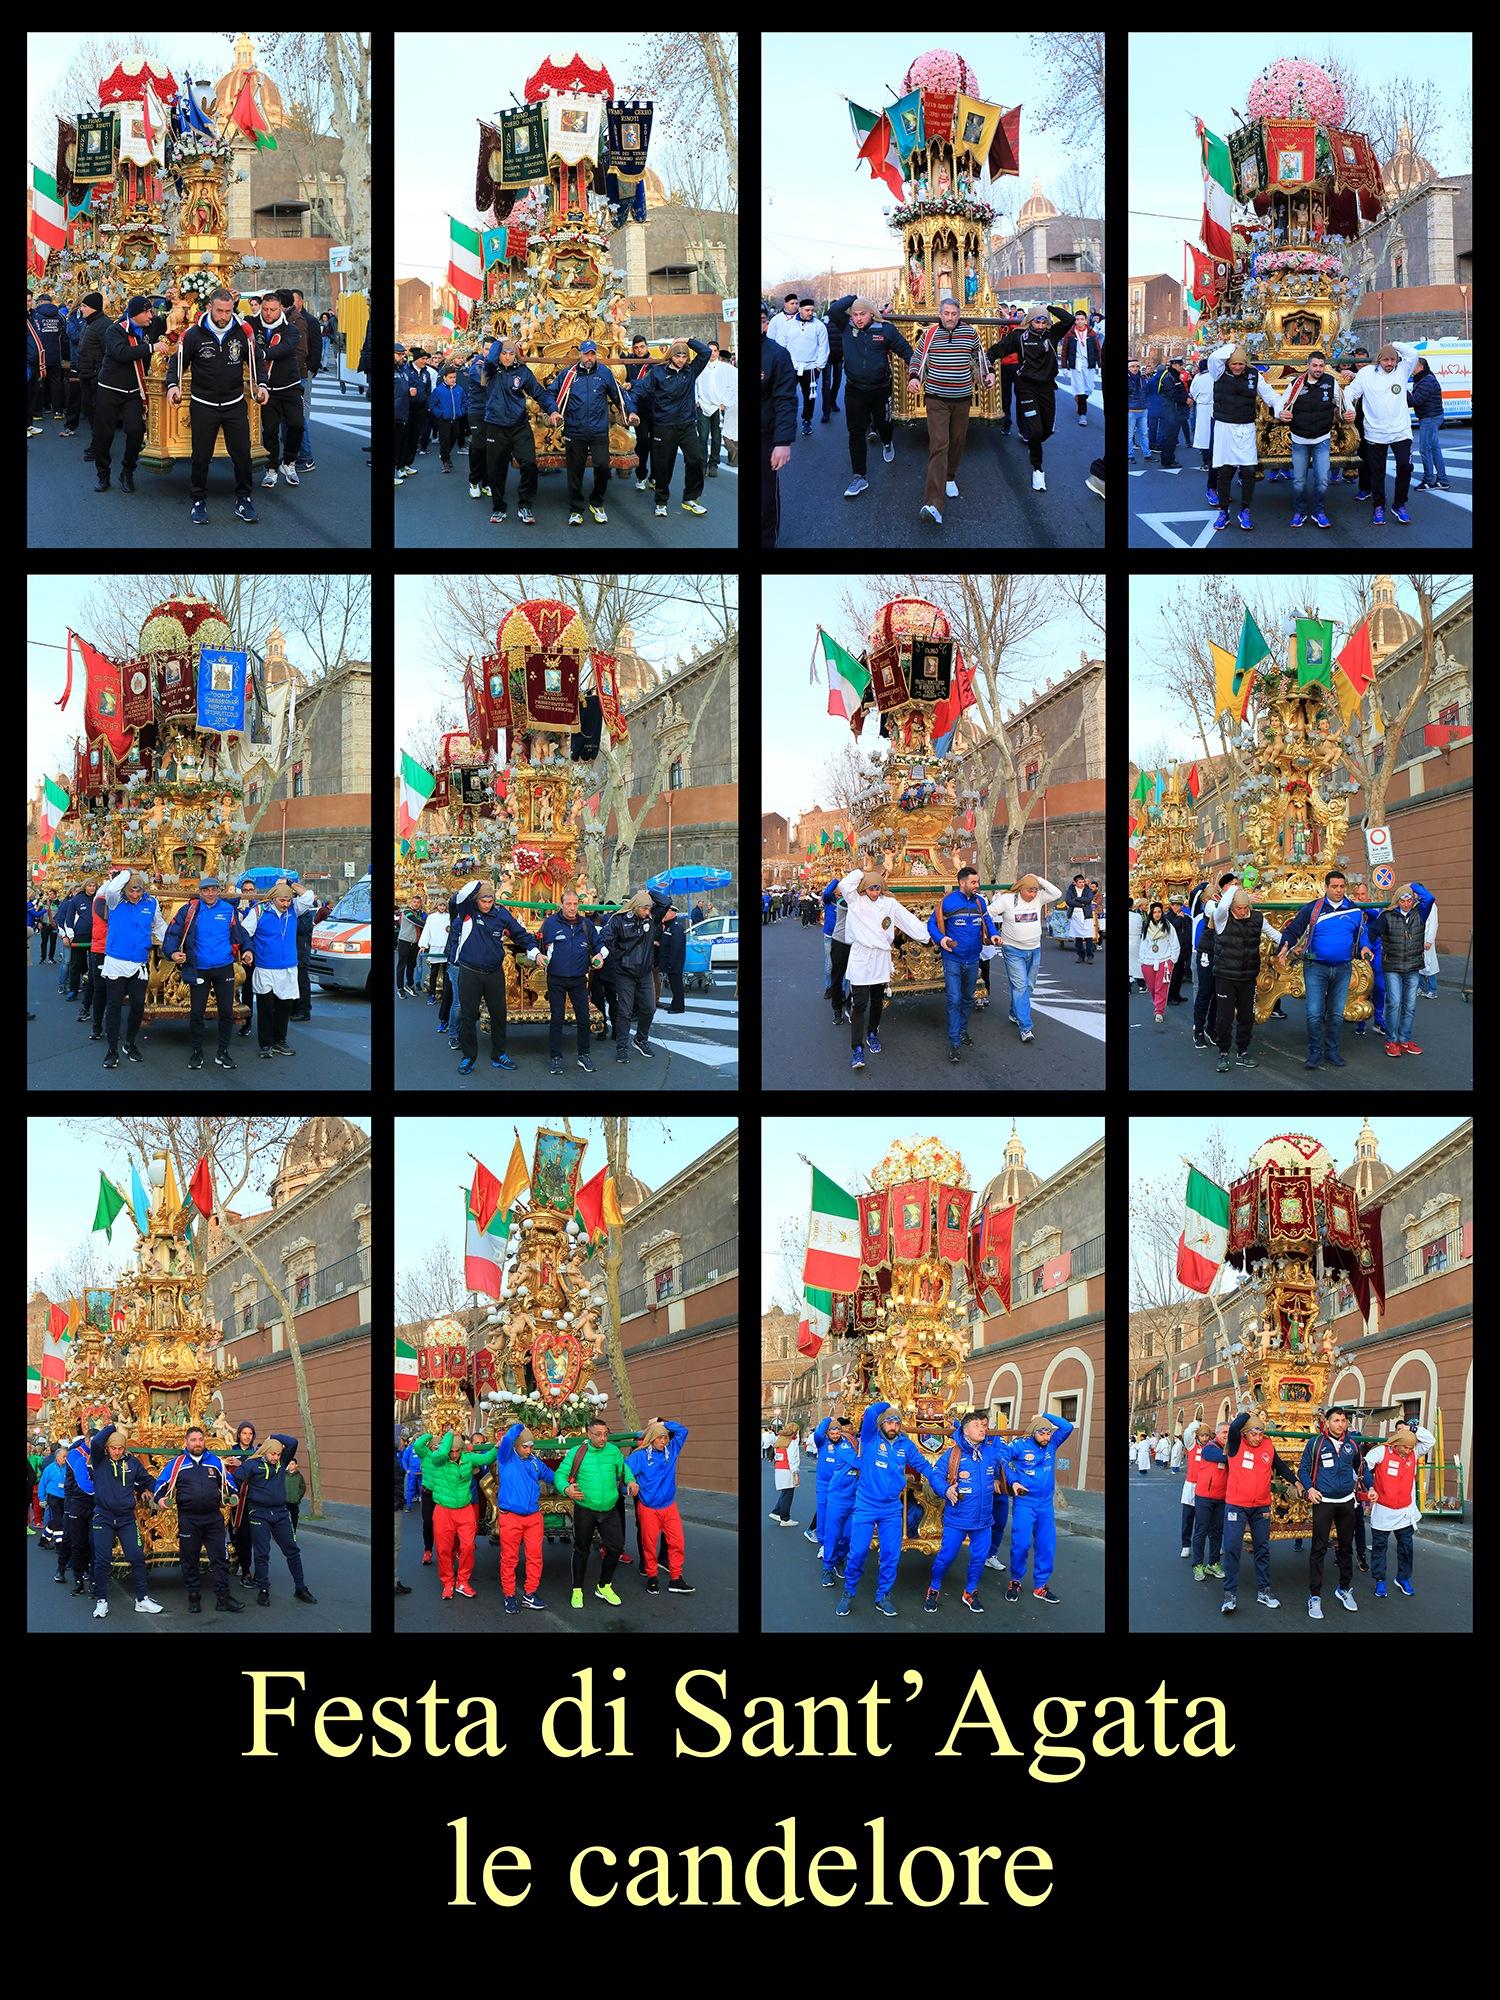 Festivities in honor of Sant'Agata 6 by Francesco Raciti